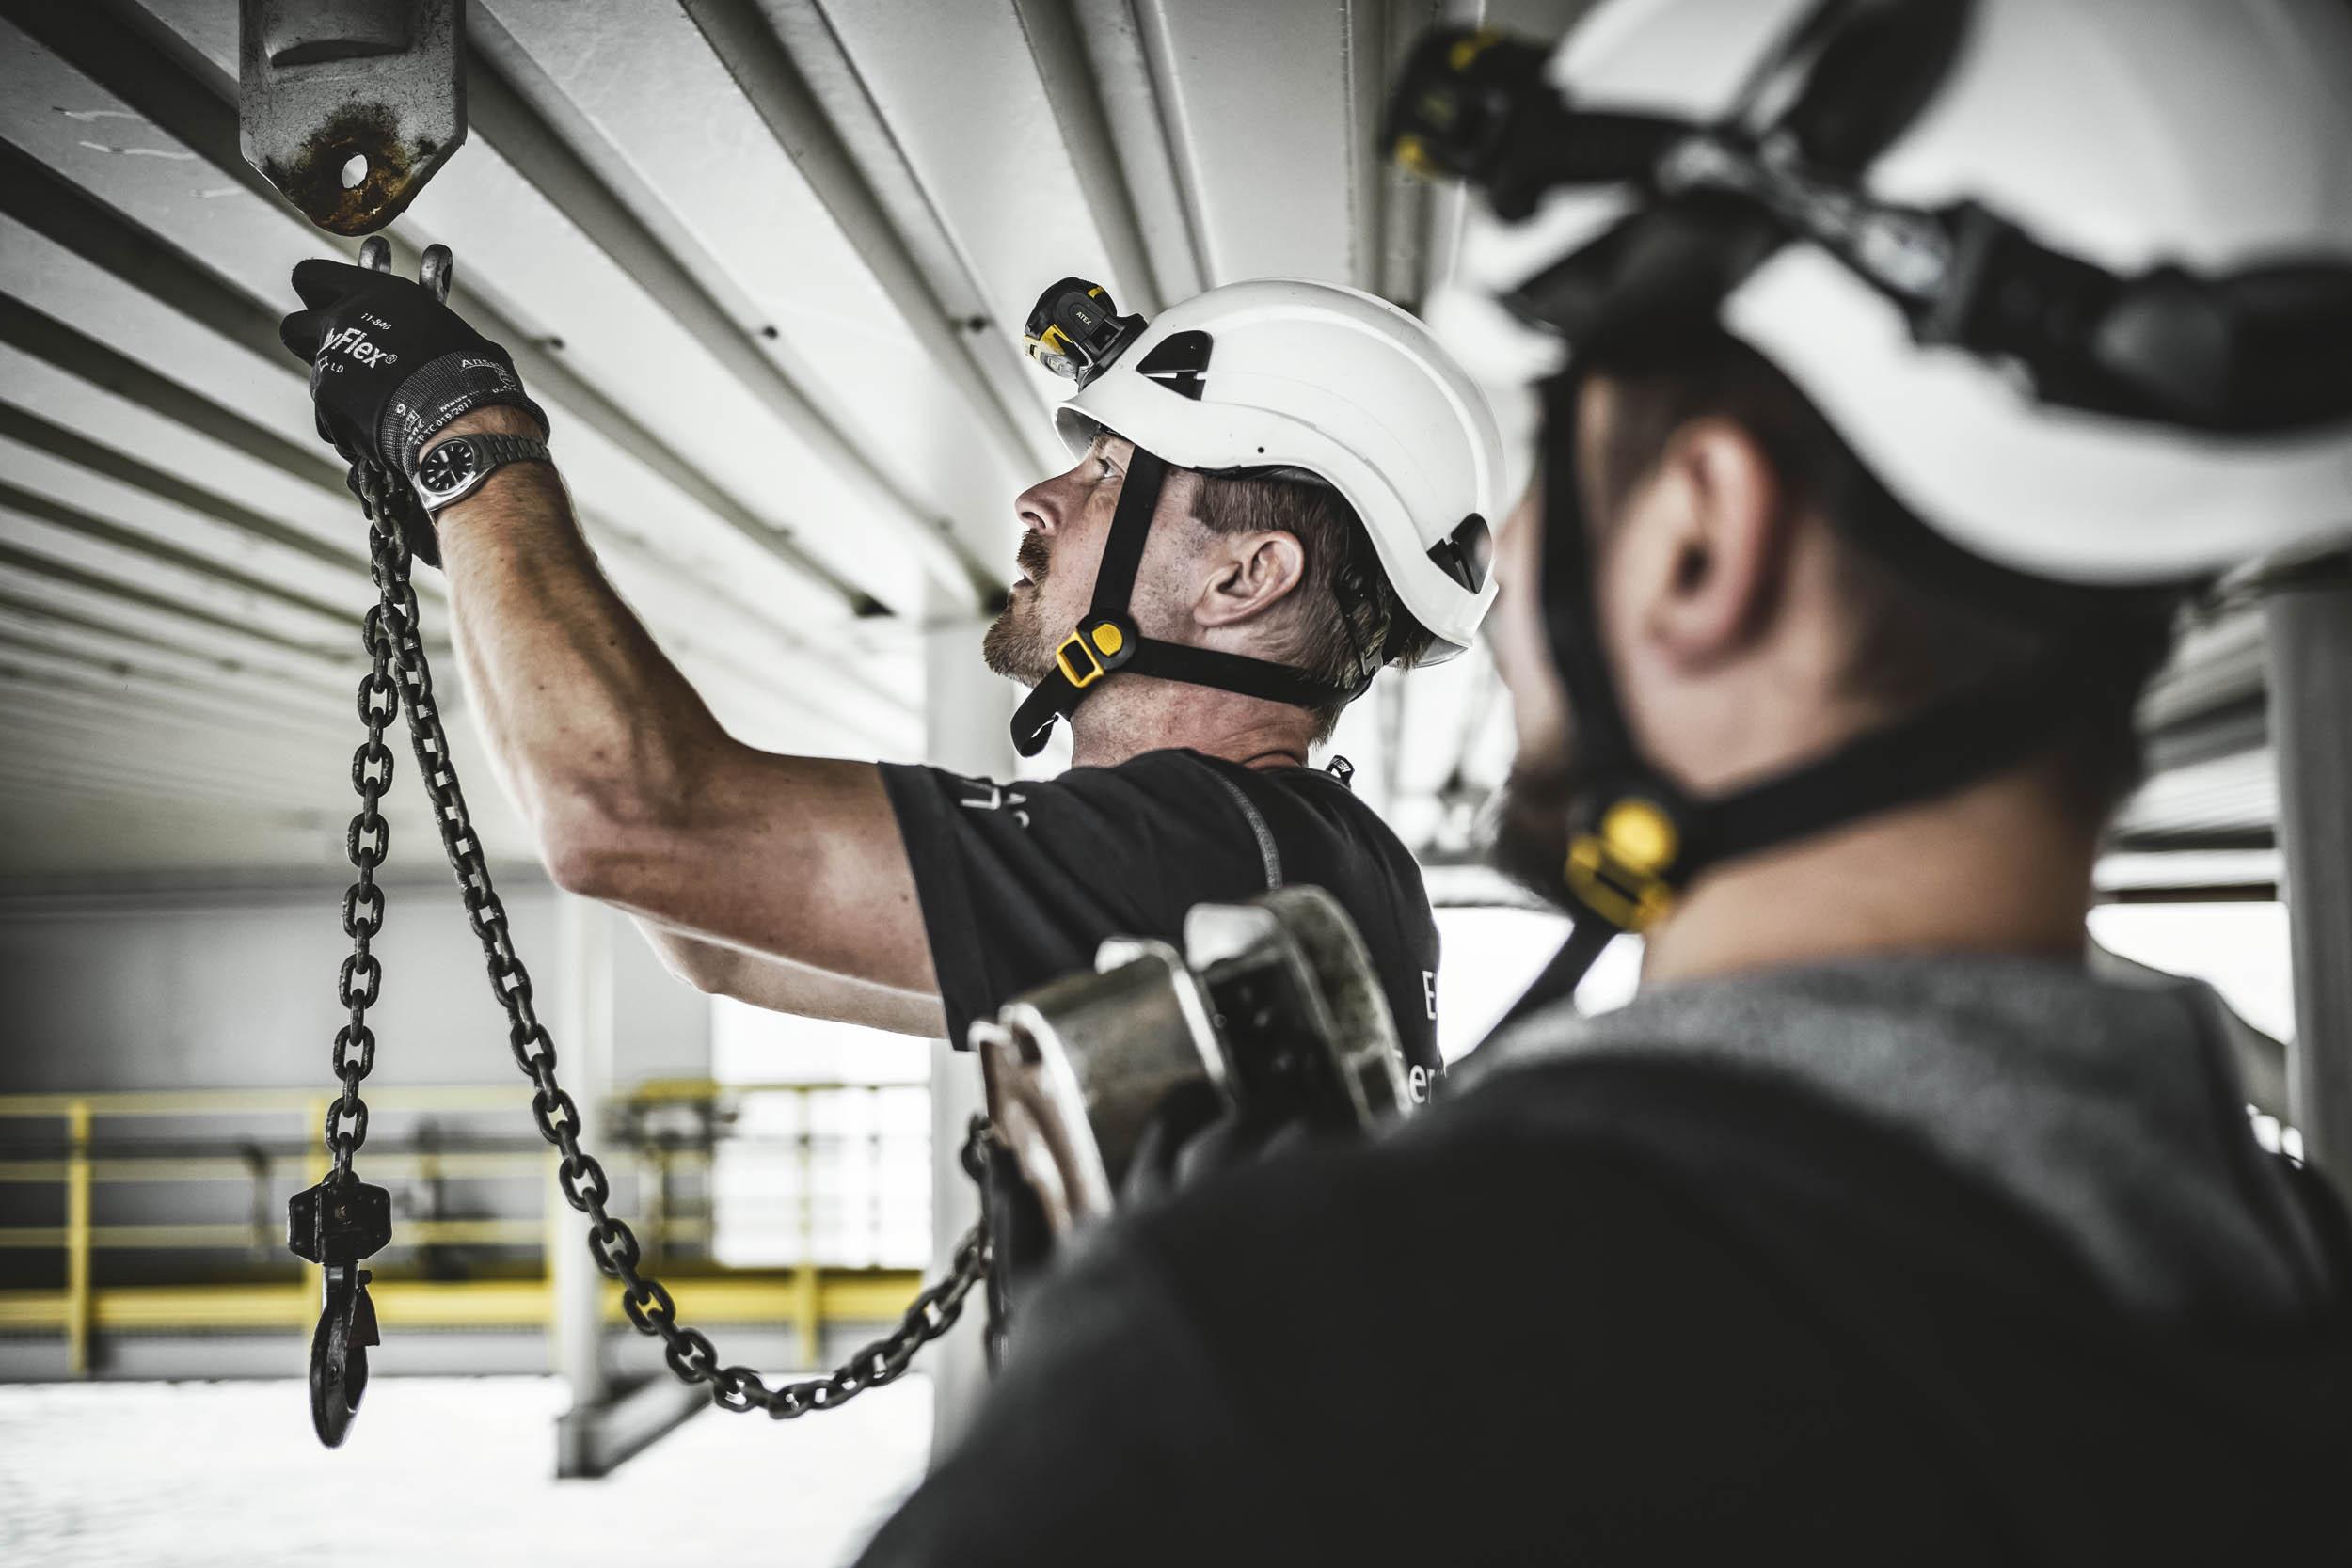 2019-SeifertUebler-EWE-offshore-windpower-025.jpg